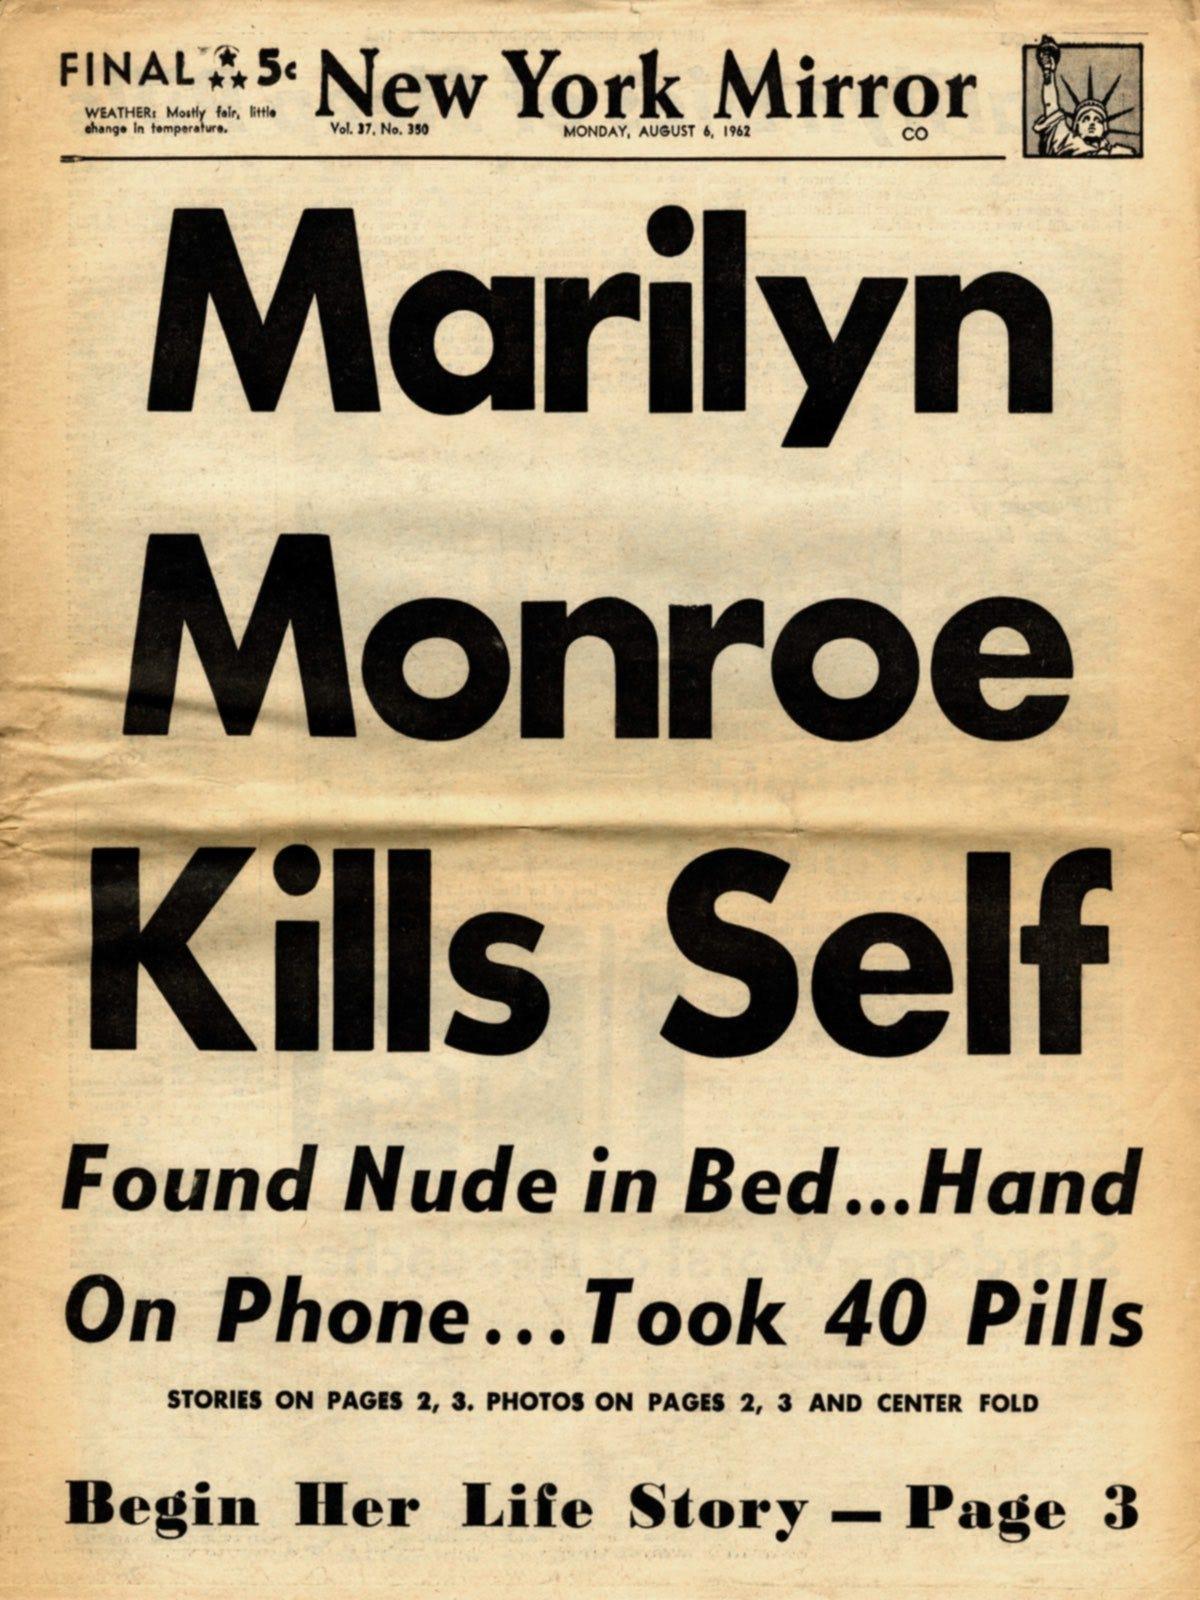 Marilyn Monroe Theunredacted Medium